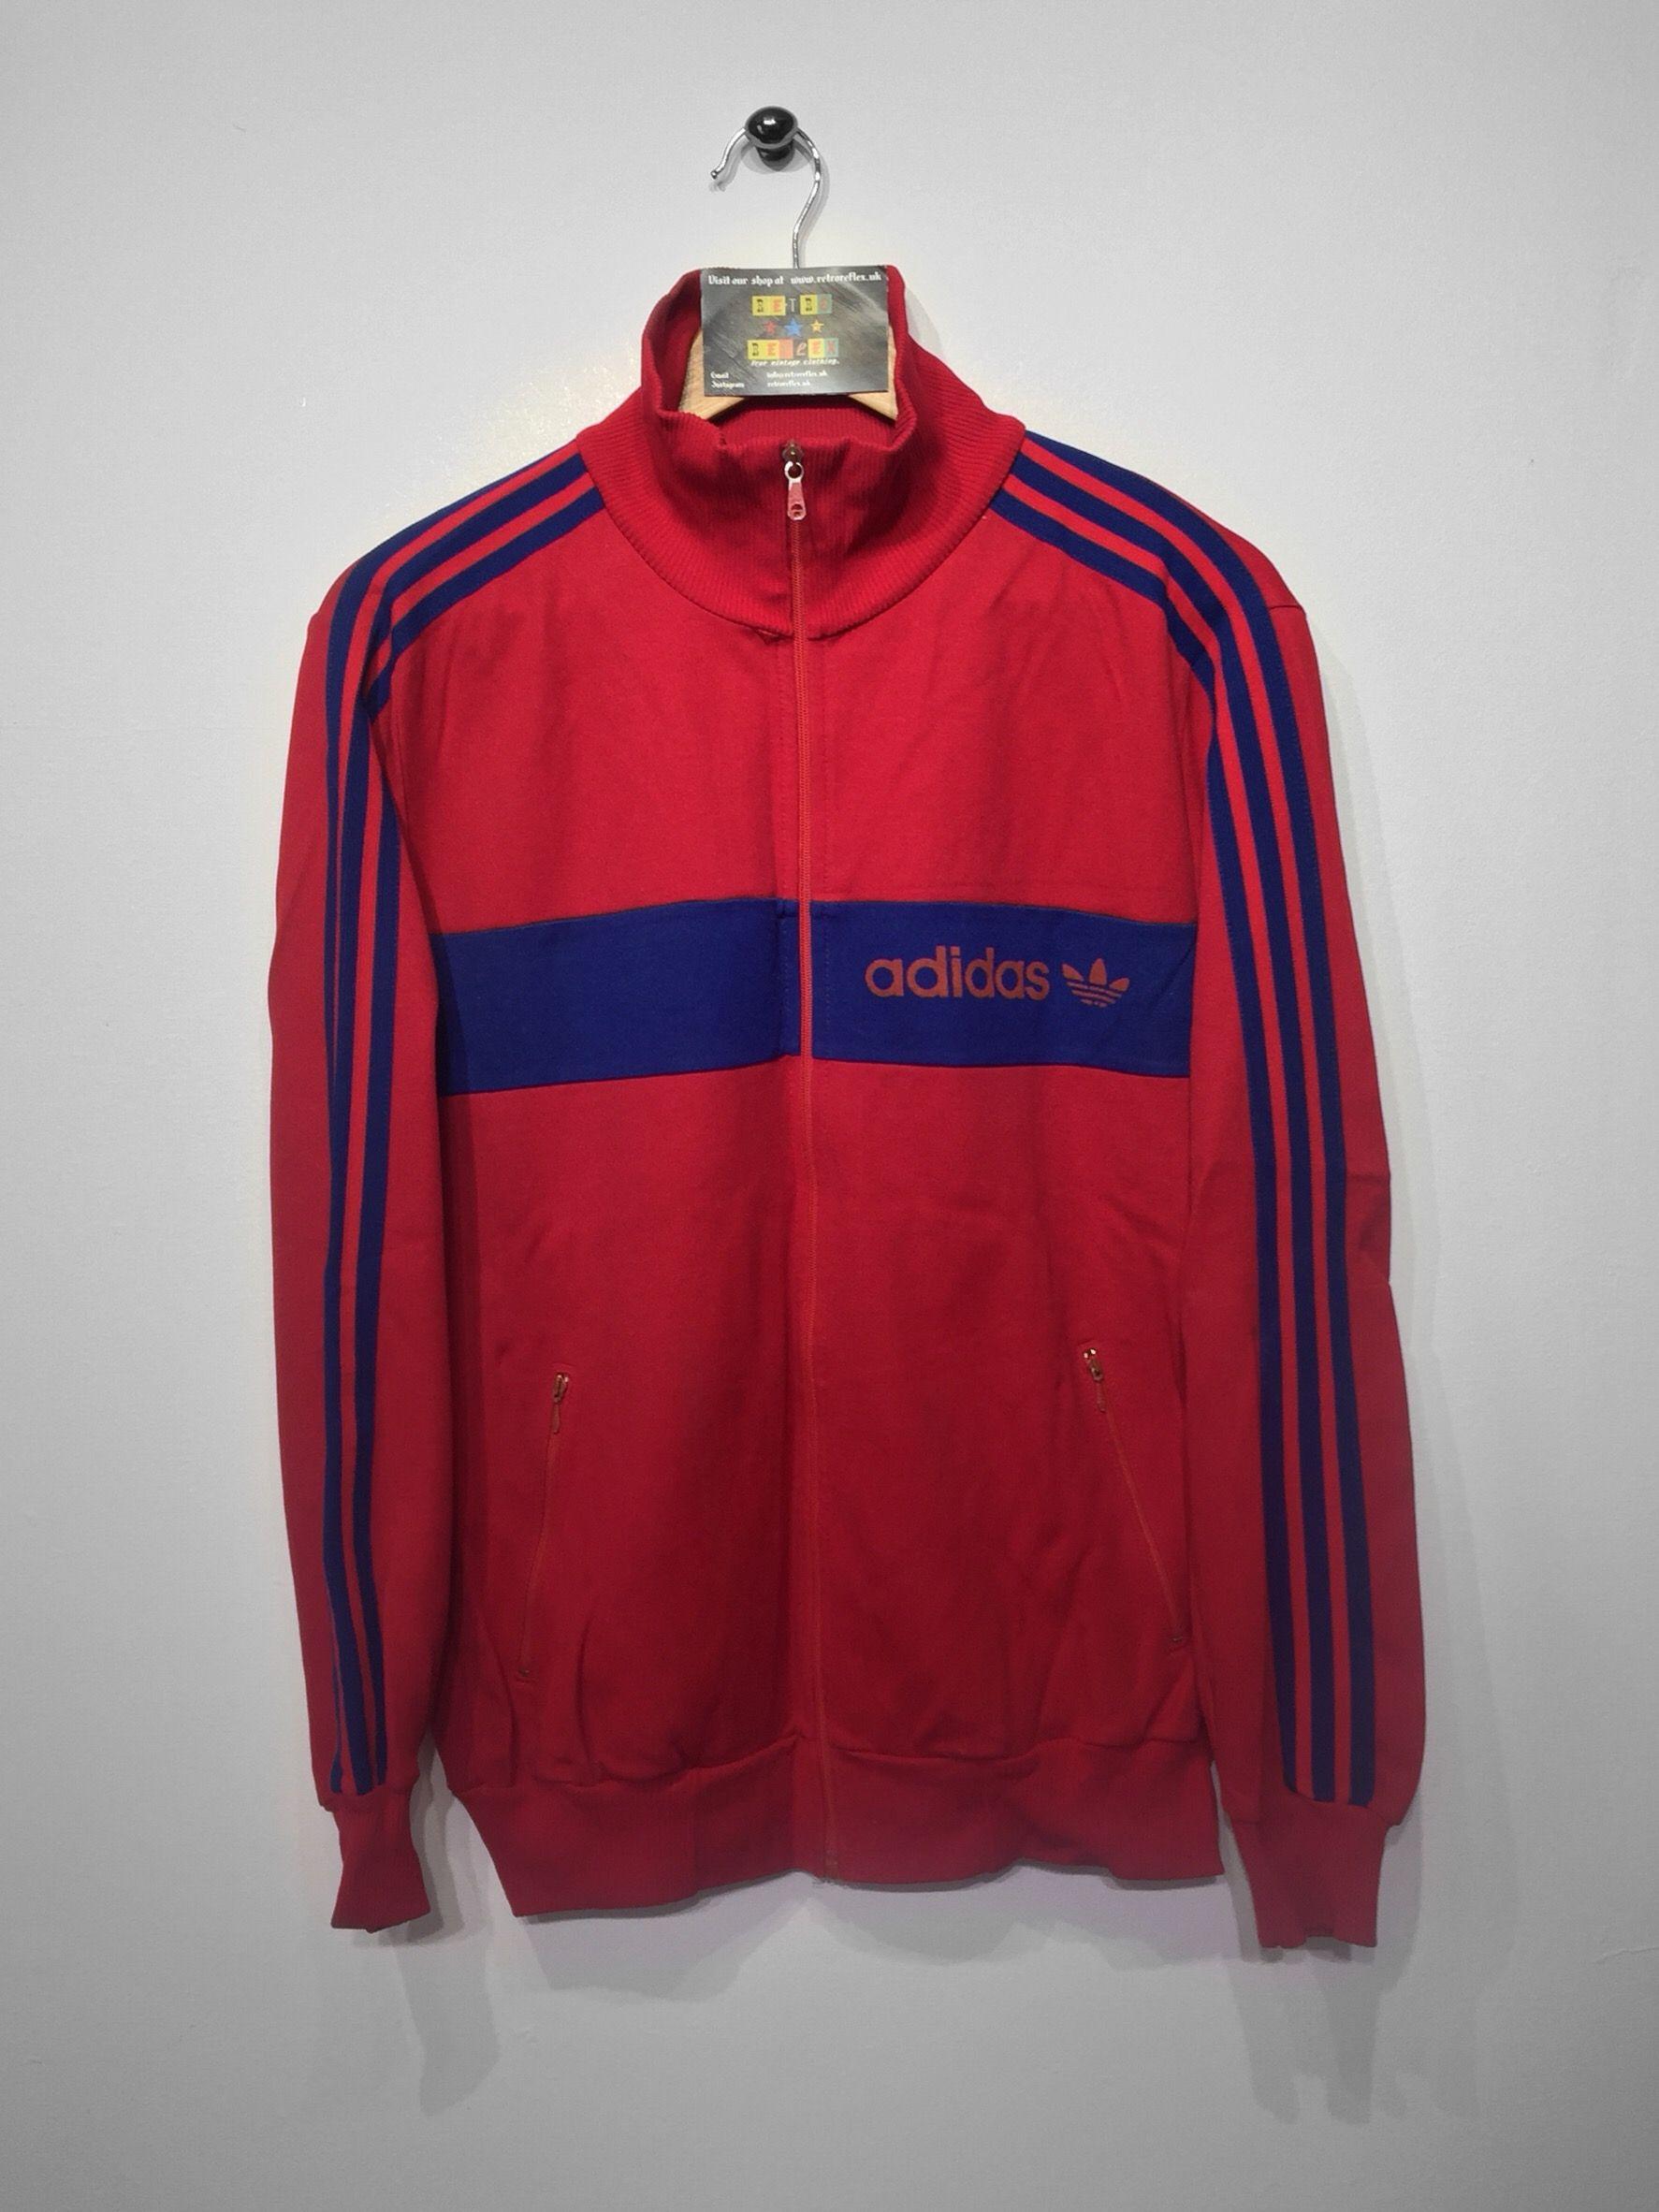 purchase cheap 5938f 3e5eb Adidas track jacket size Medium £28 Website➡ www.retroreflex.uk